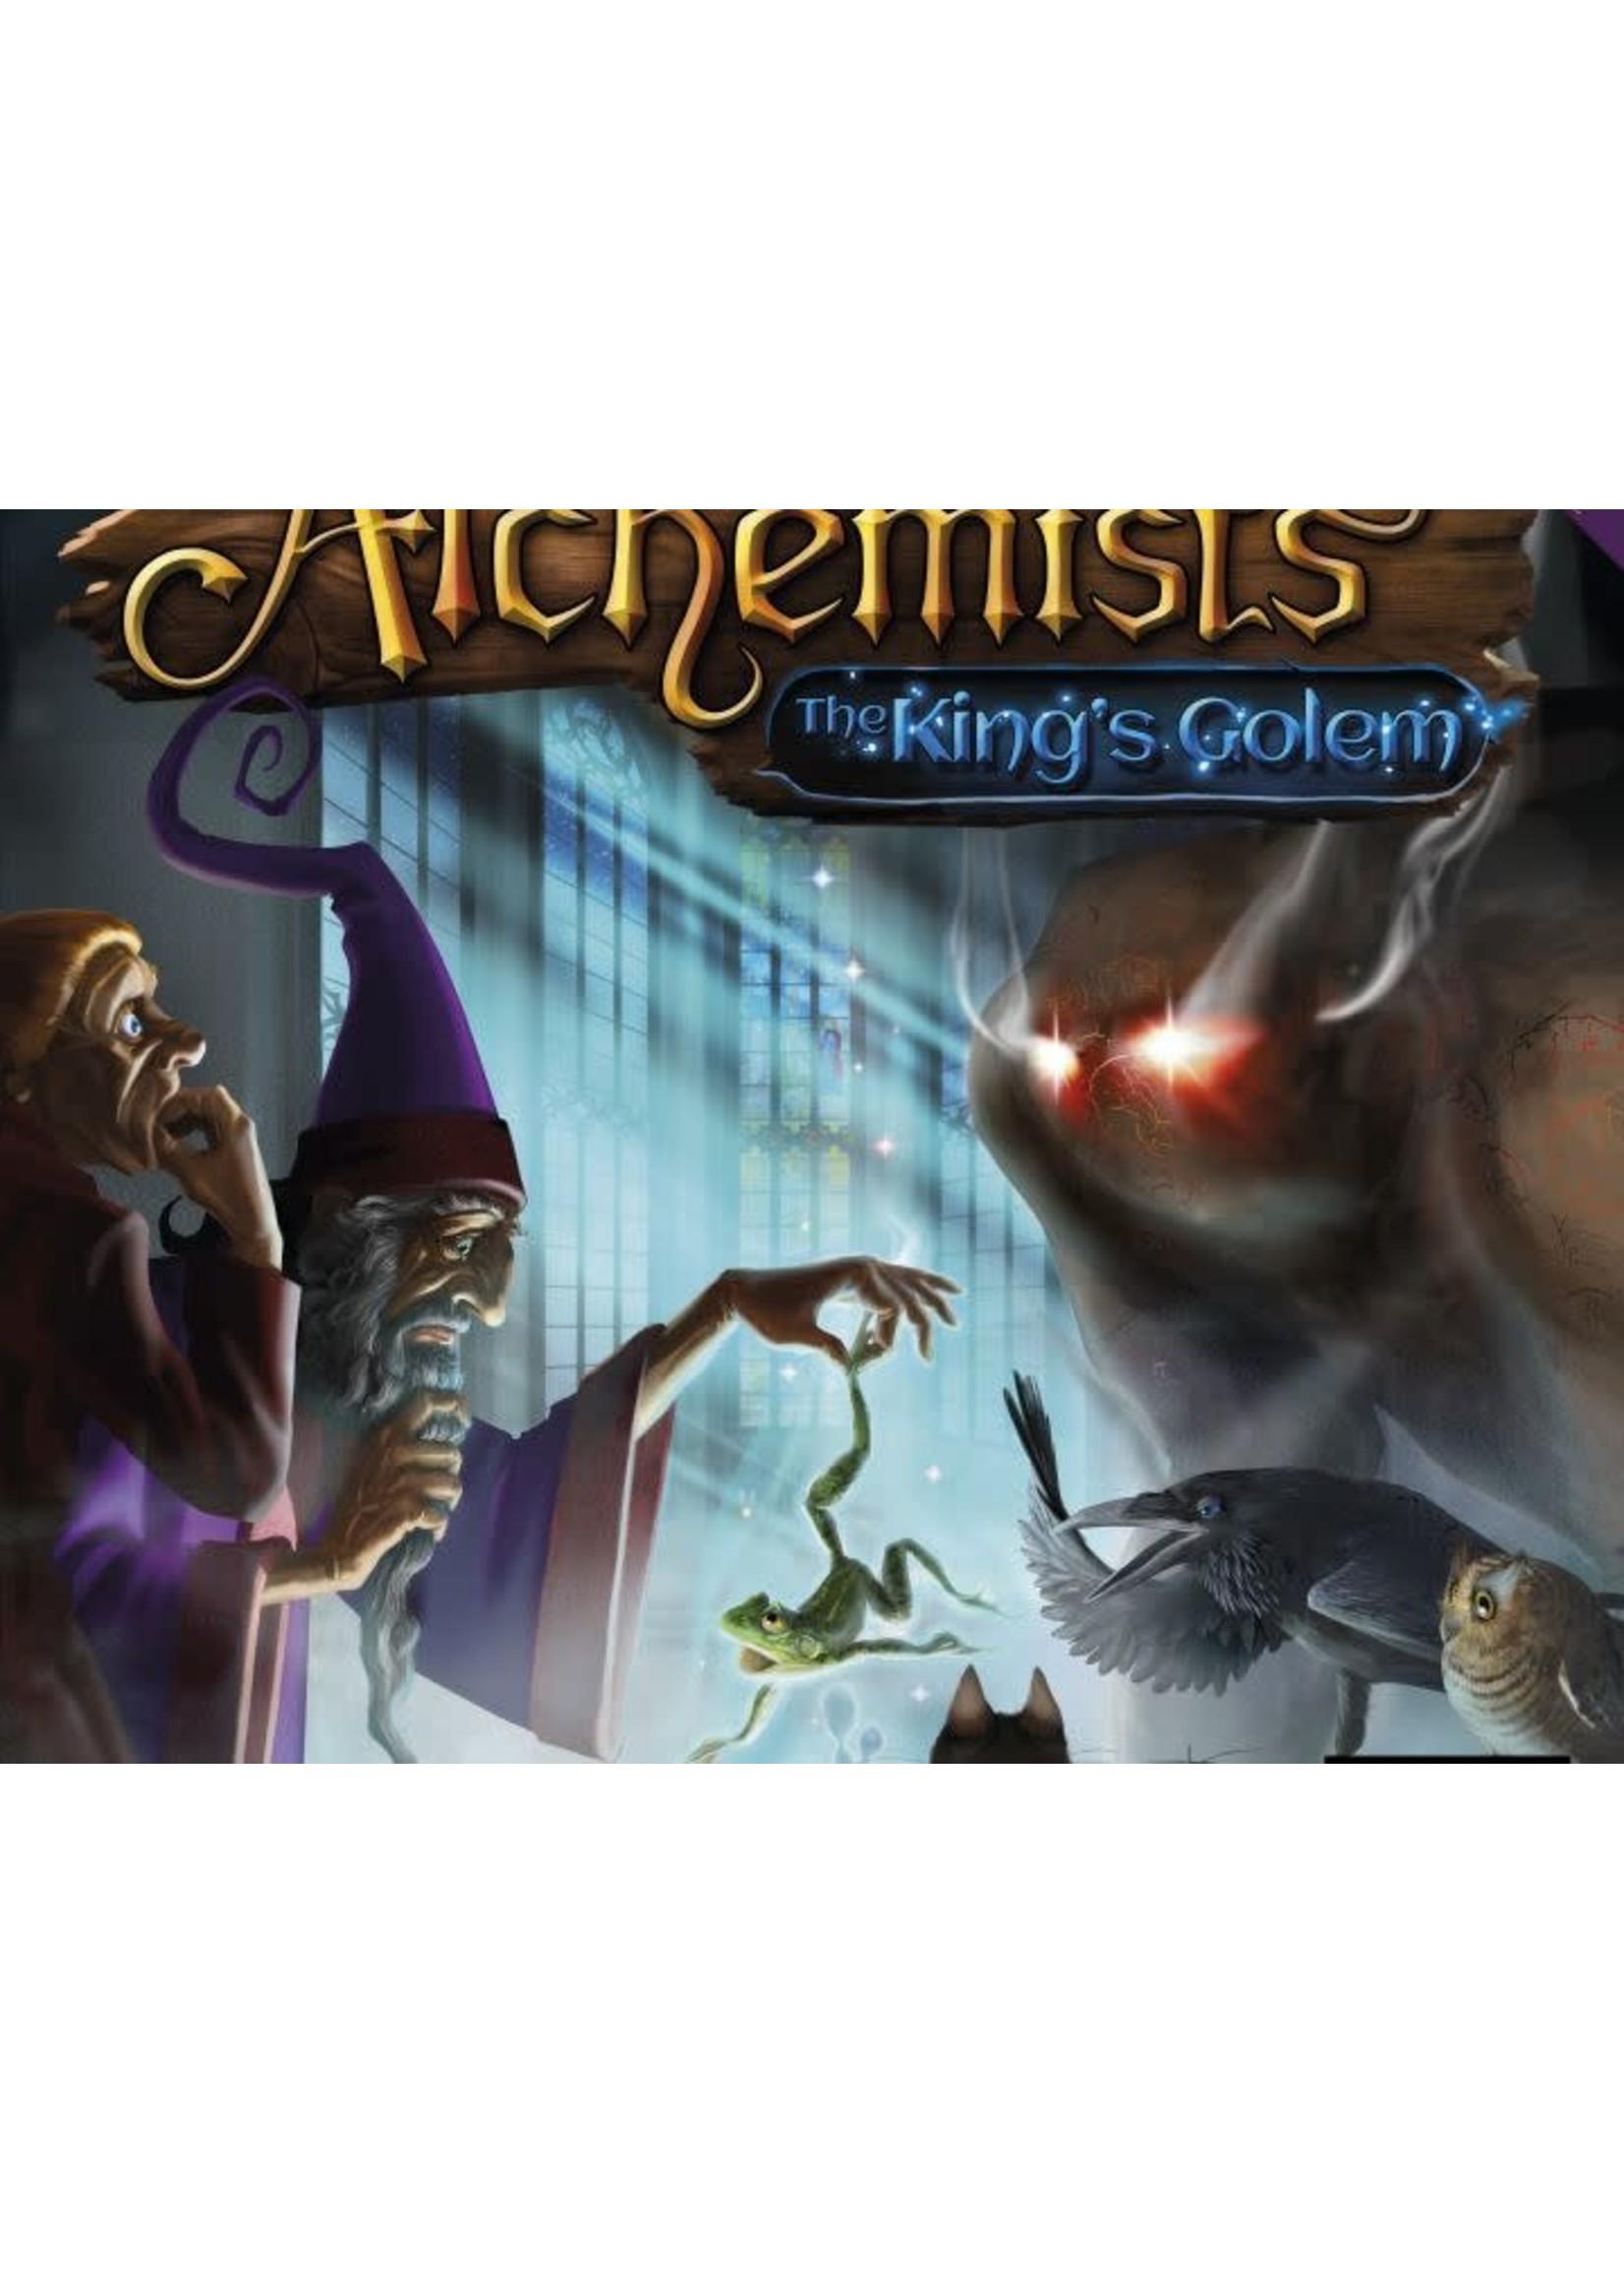 Alchemists King'S Golem